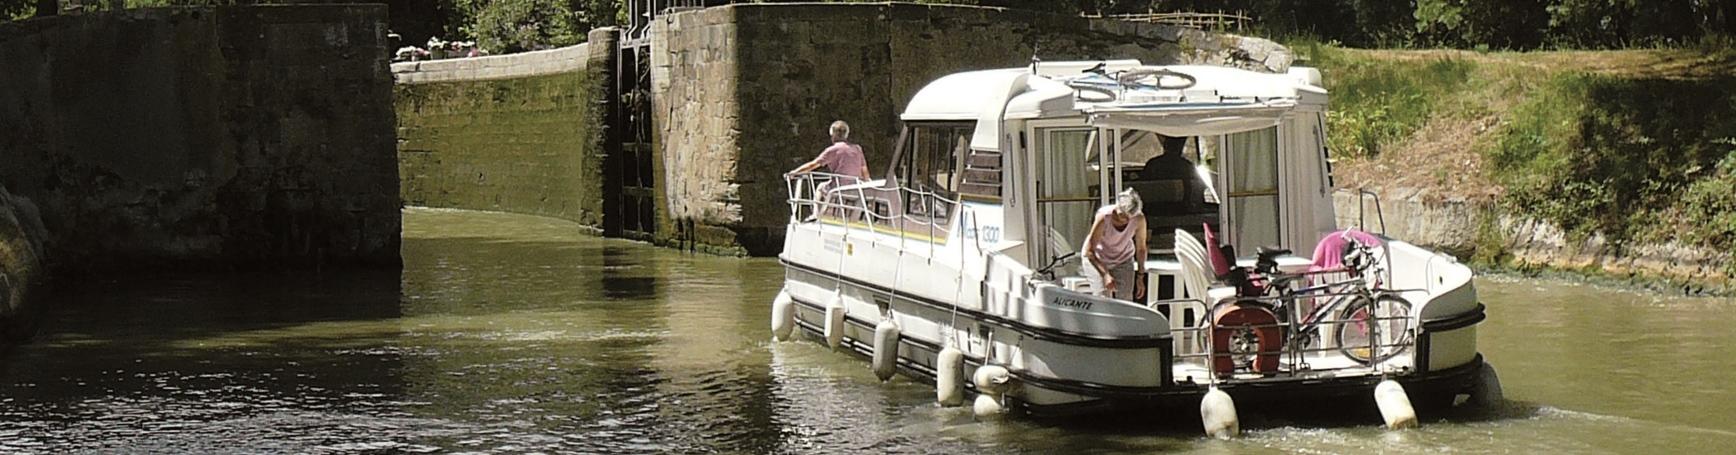 passer le permis bateau c u00f4tiere ou fluviale